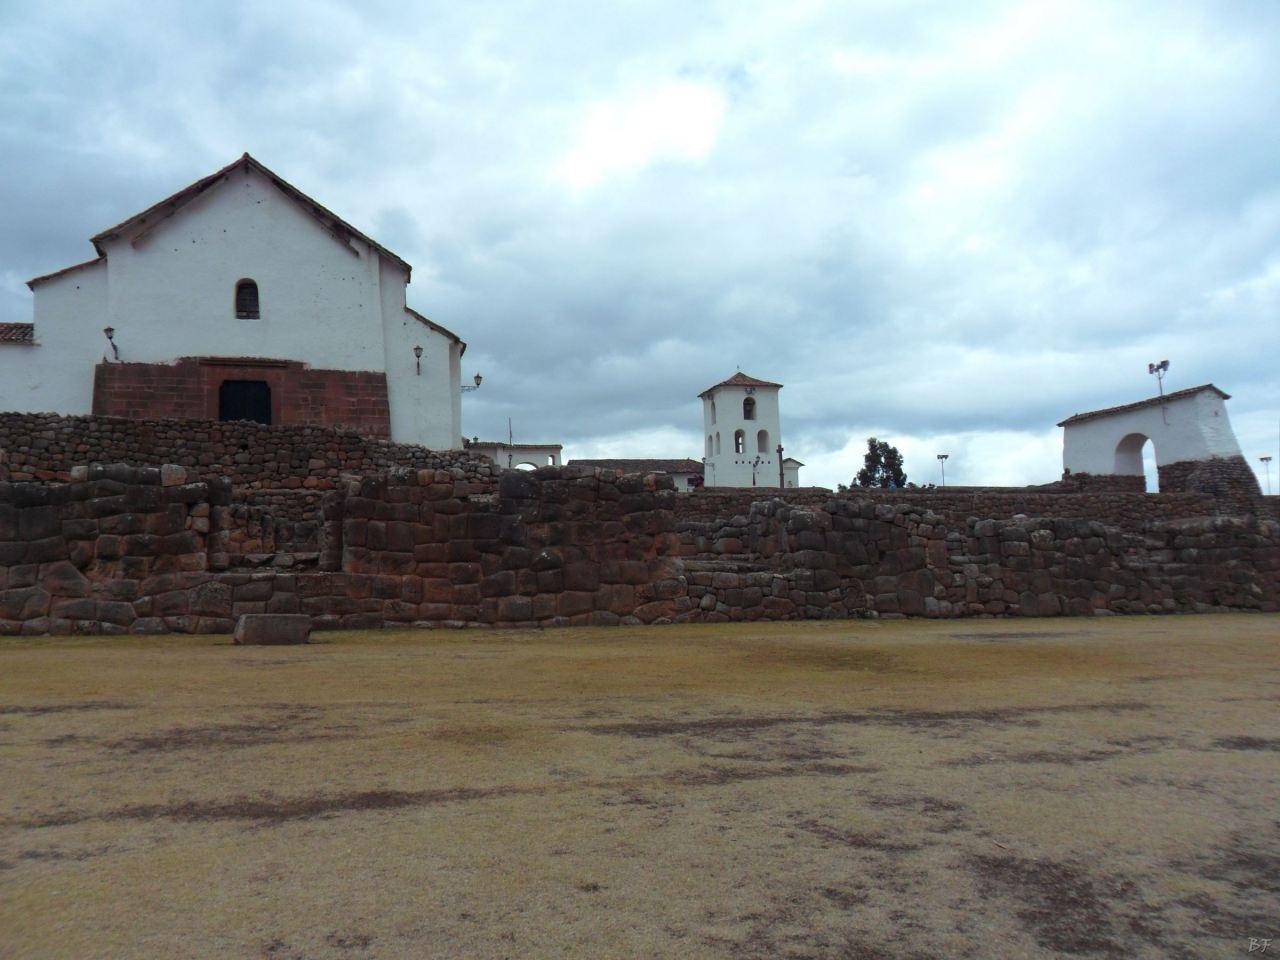 Chinchero-Mura-Poligonali-Piramide-Urubamba-Peru-30